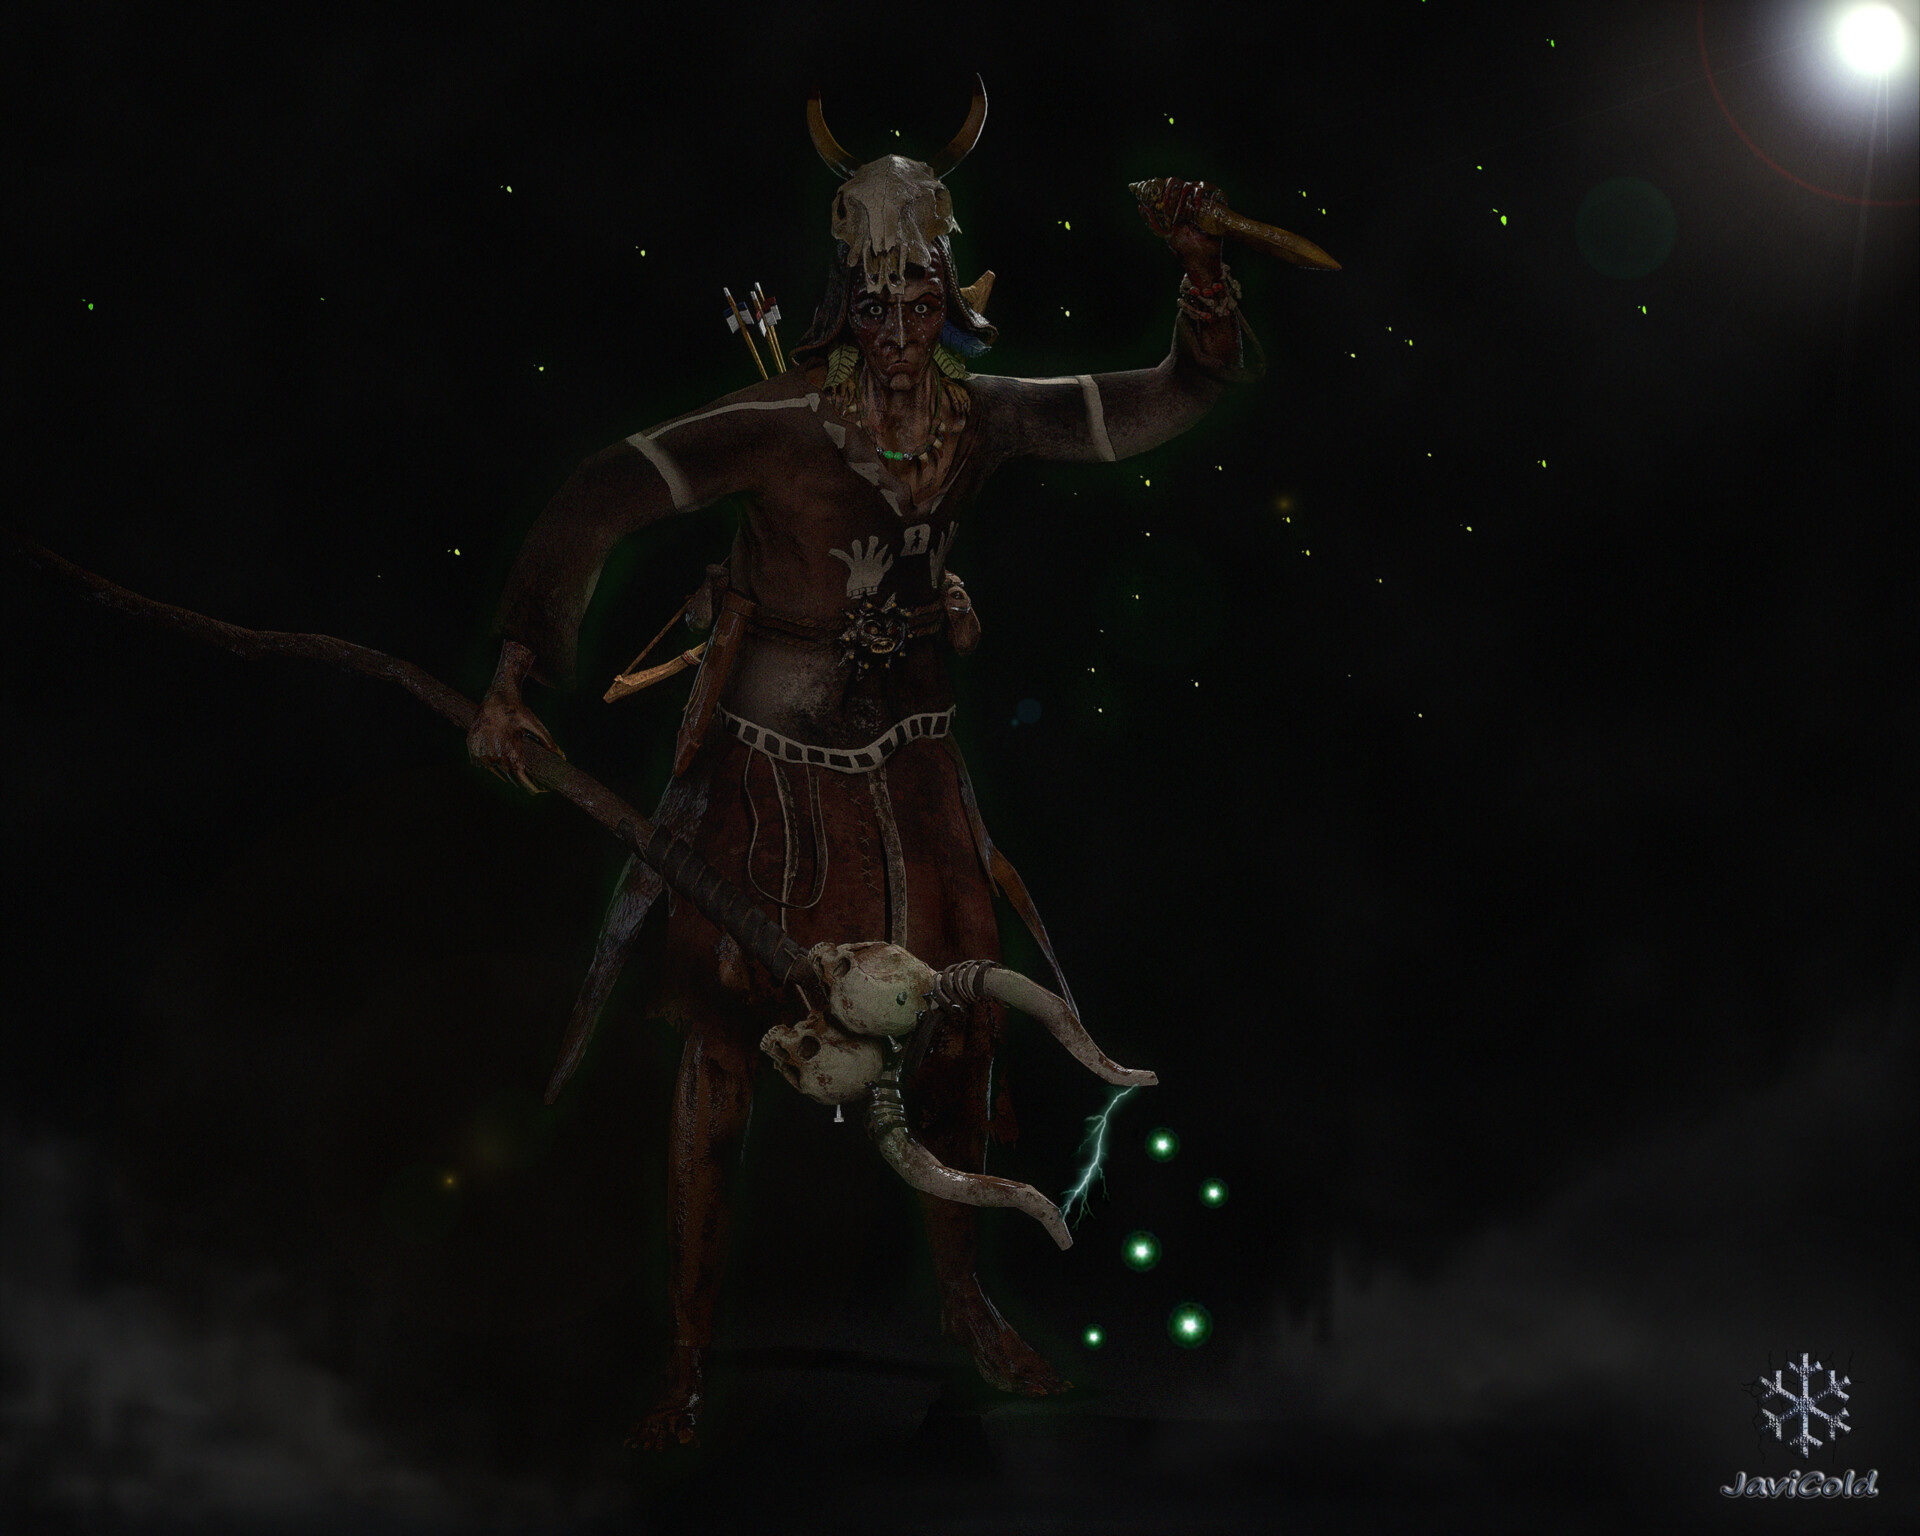 ArtStation - Mystic Shaman, JaviCold95 Muñoz